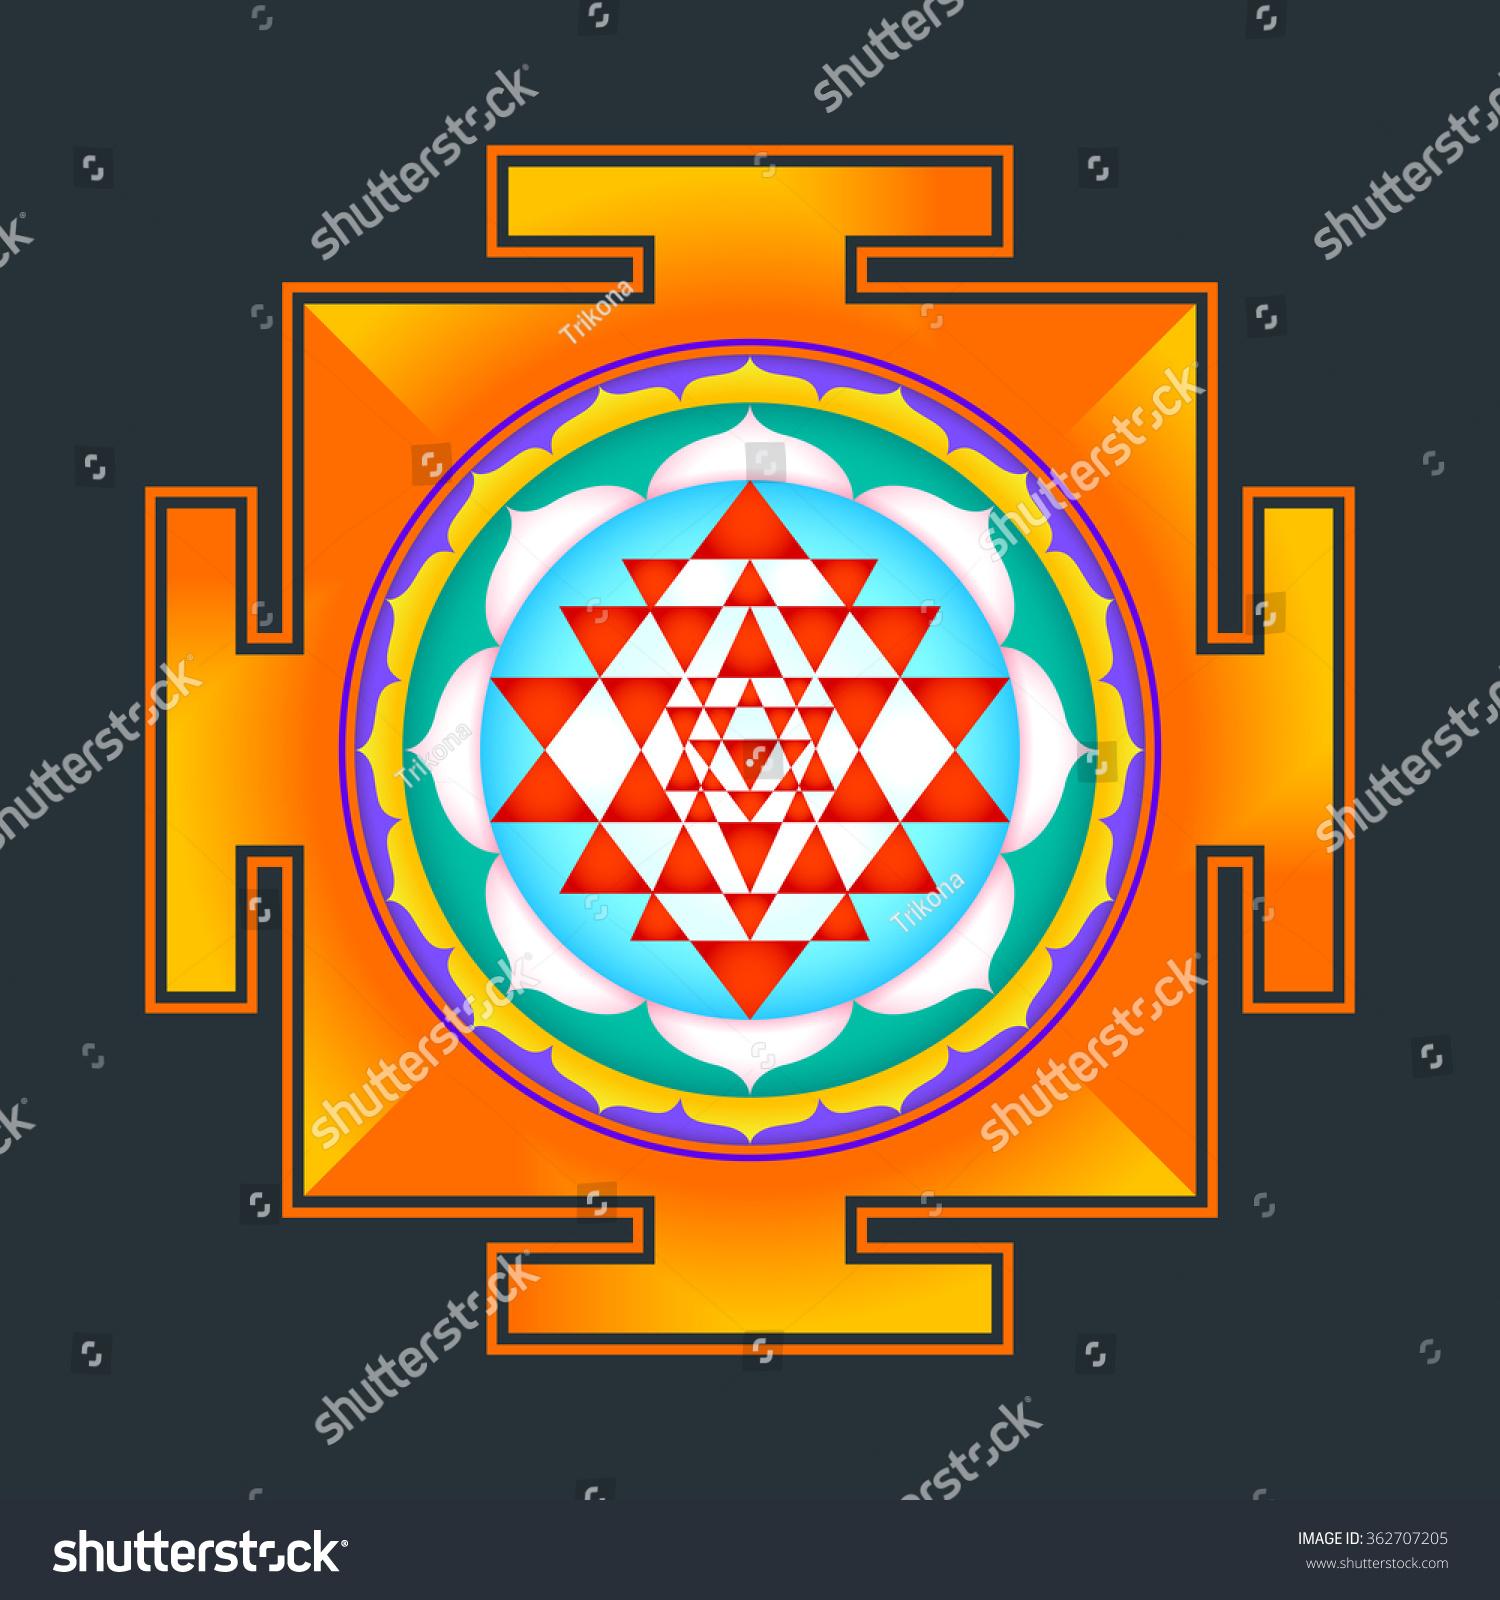 stock photo colored hinduism sri yantra sri chakra illustration triangles diagram isolated on black background 362707205 royalty free stock illustration of colored hinduism sri yantra sri